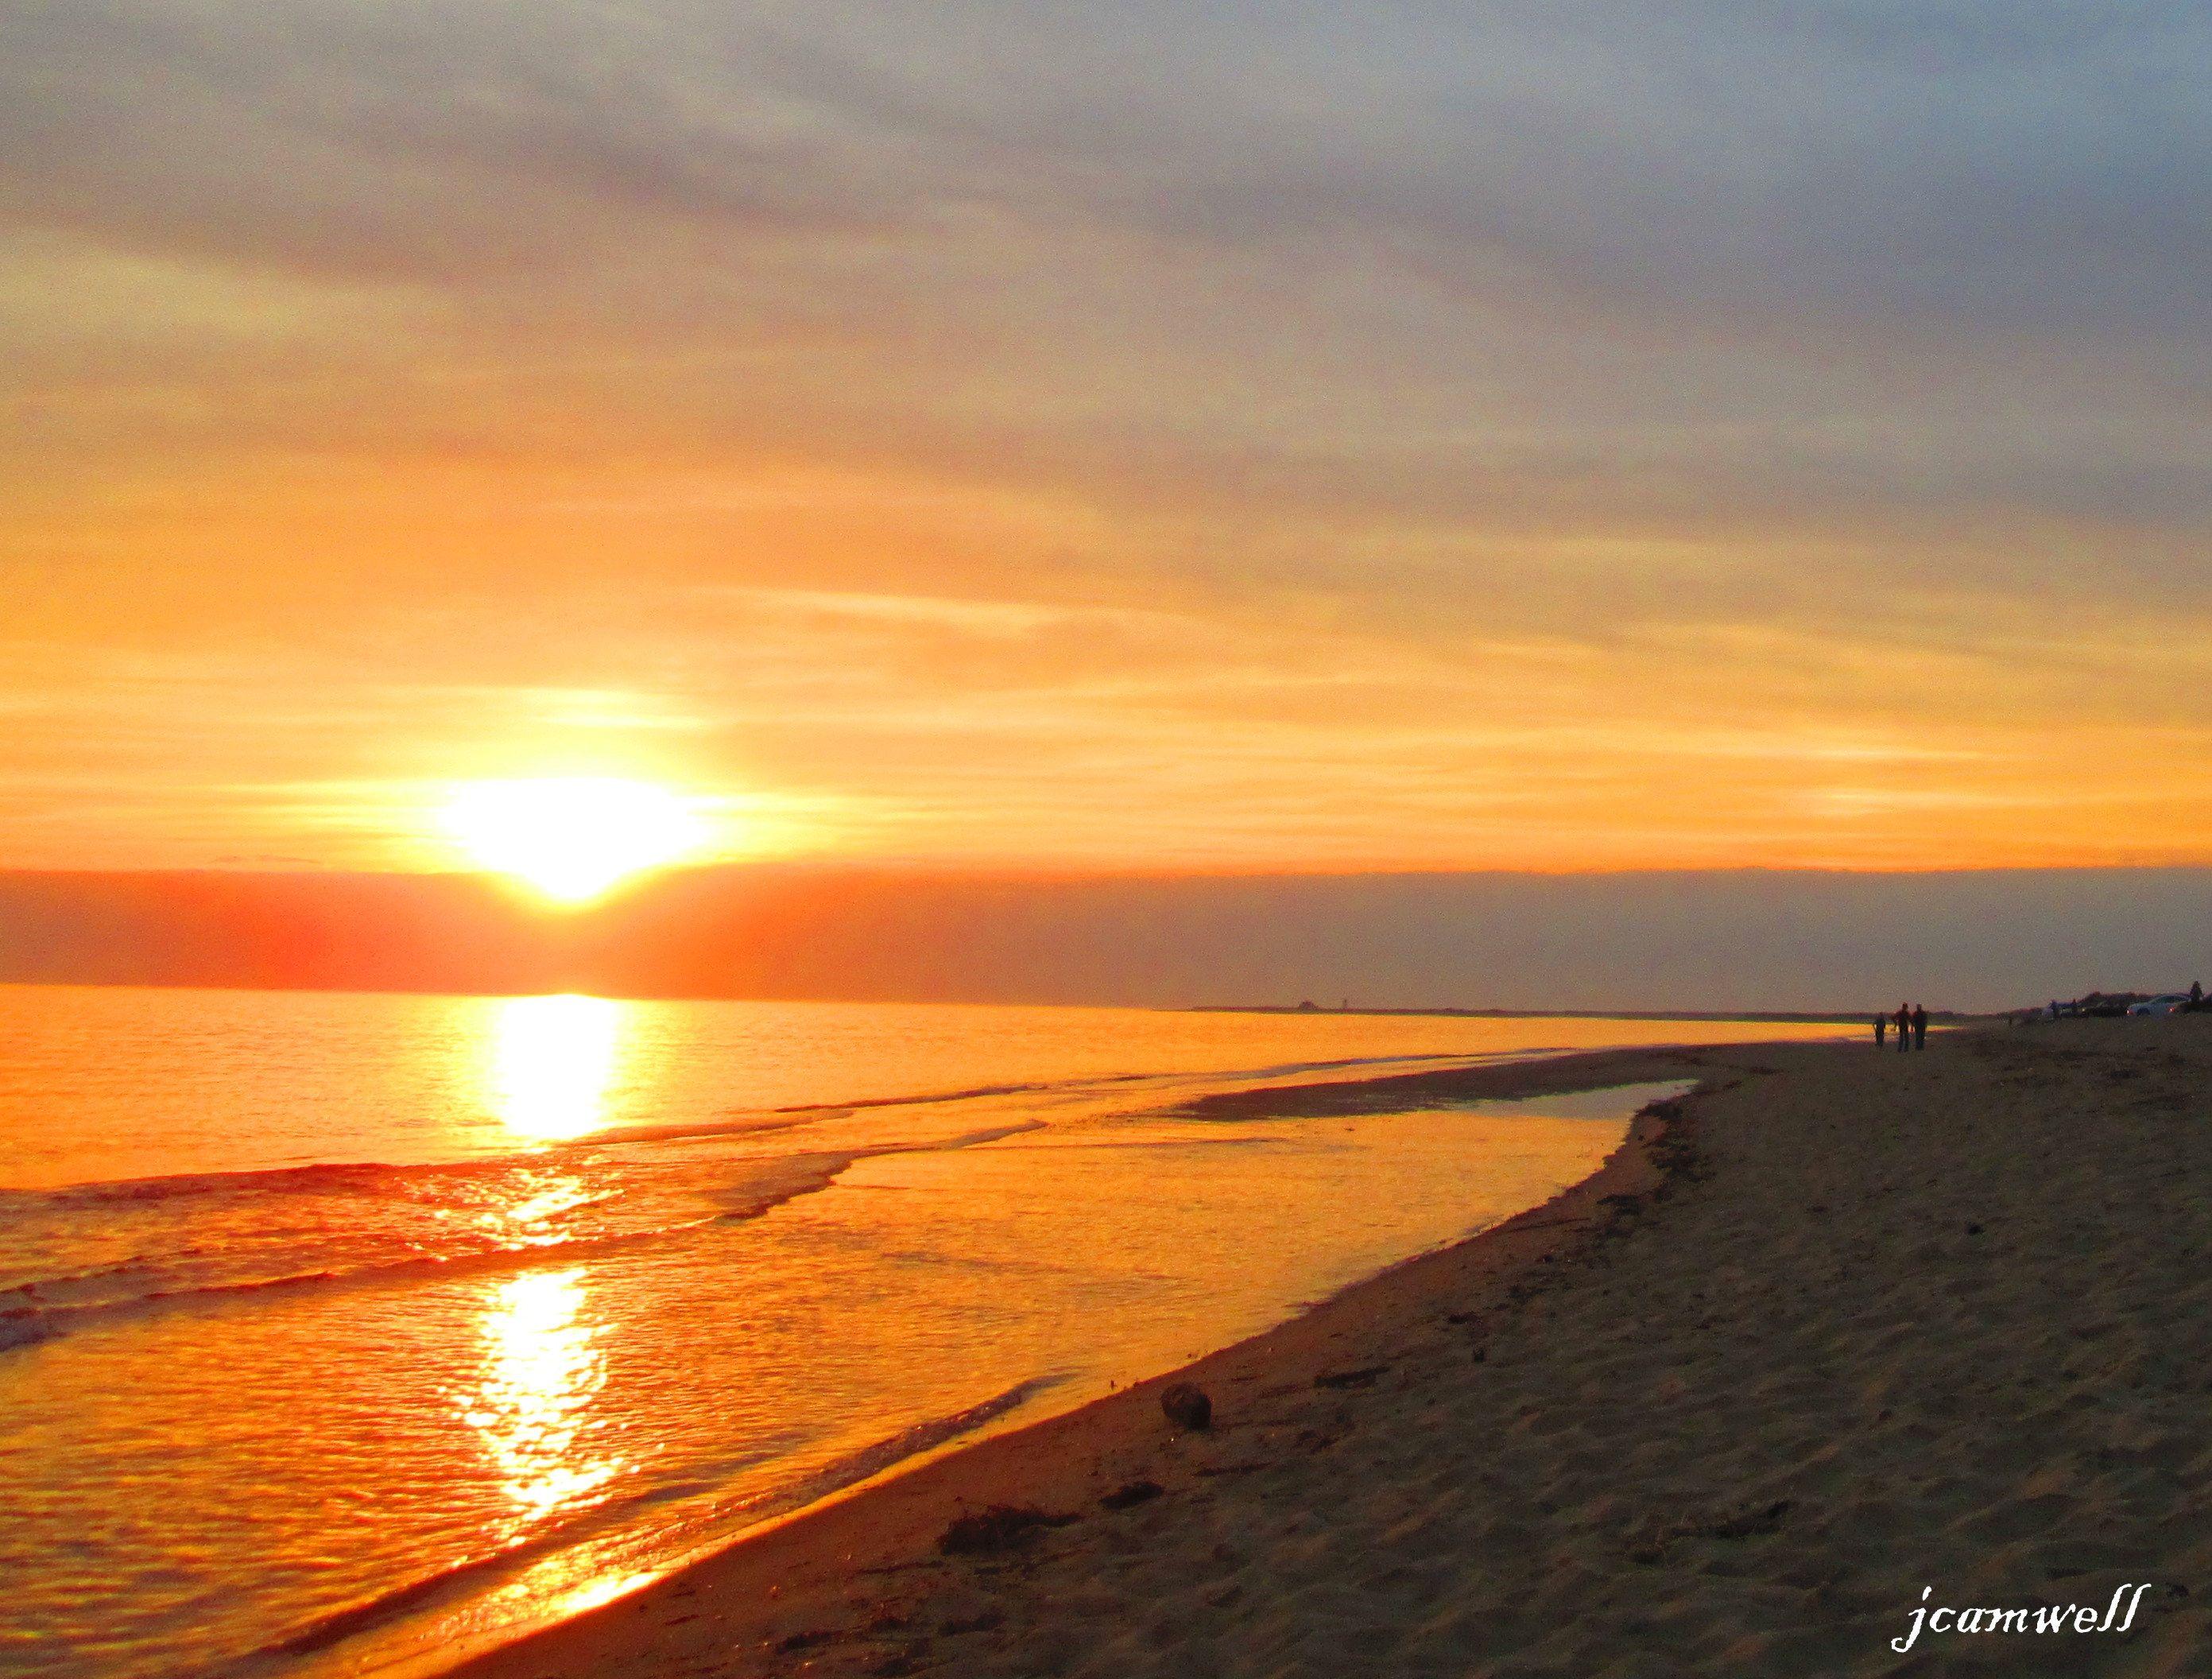 Herring Cove - Cape Cod - at sunset  photo by Jude Nagurney Camwell